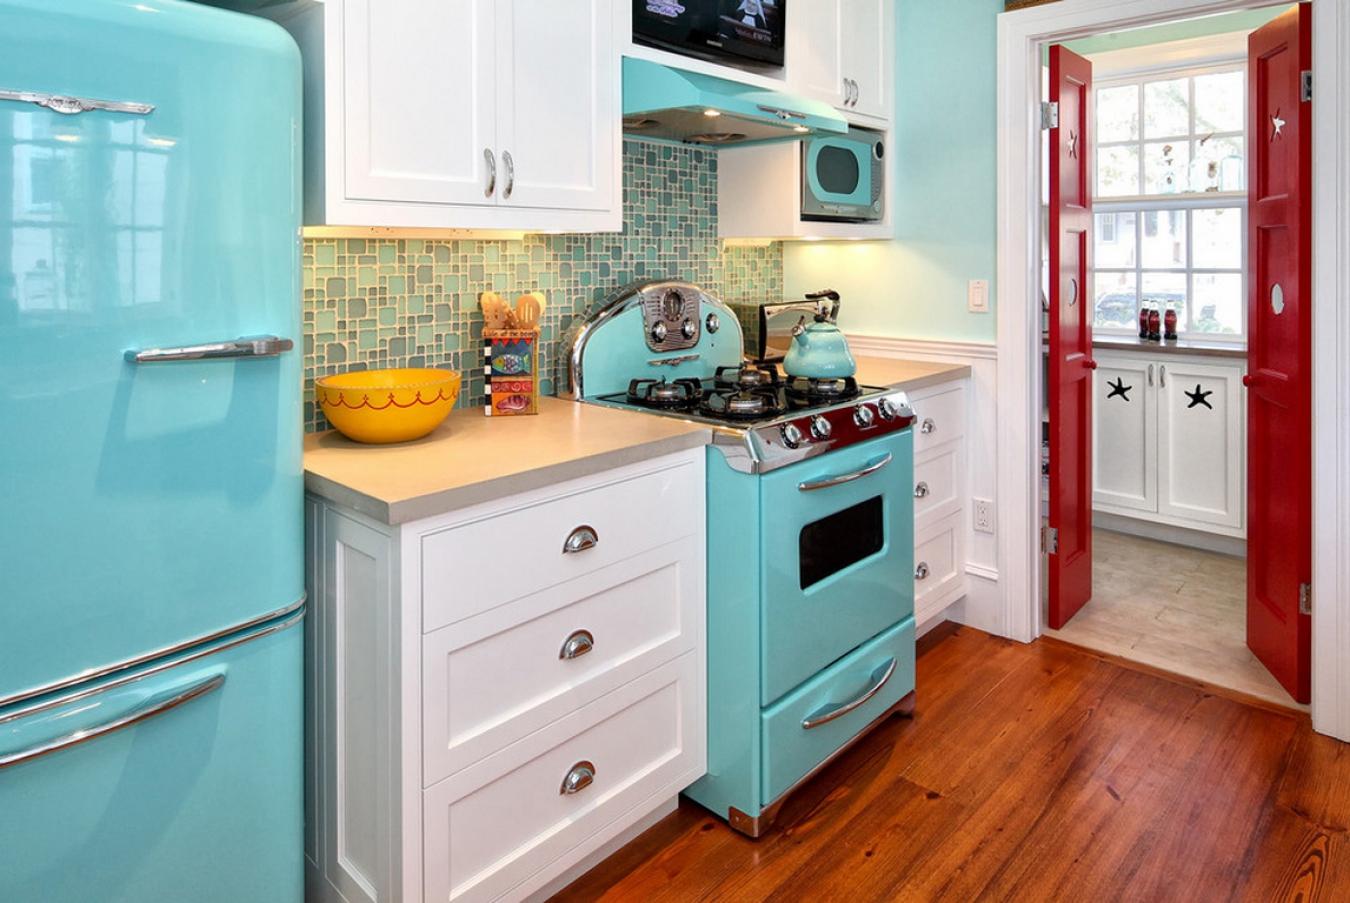 Два холодильника на кухне дизайн